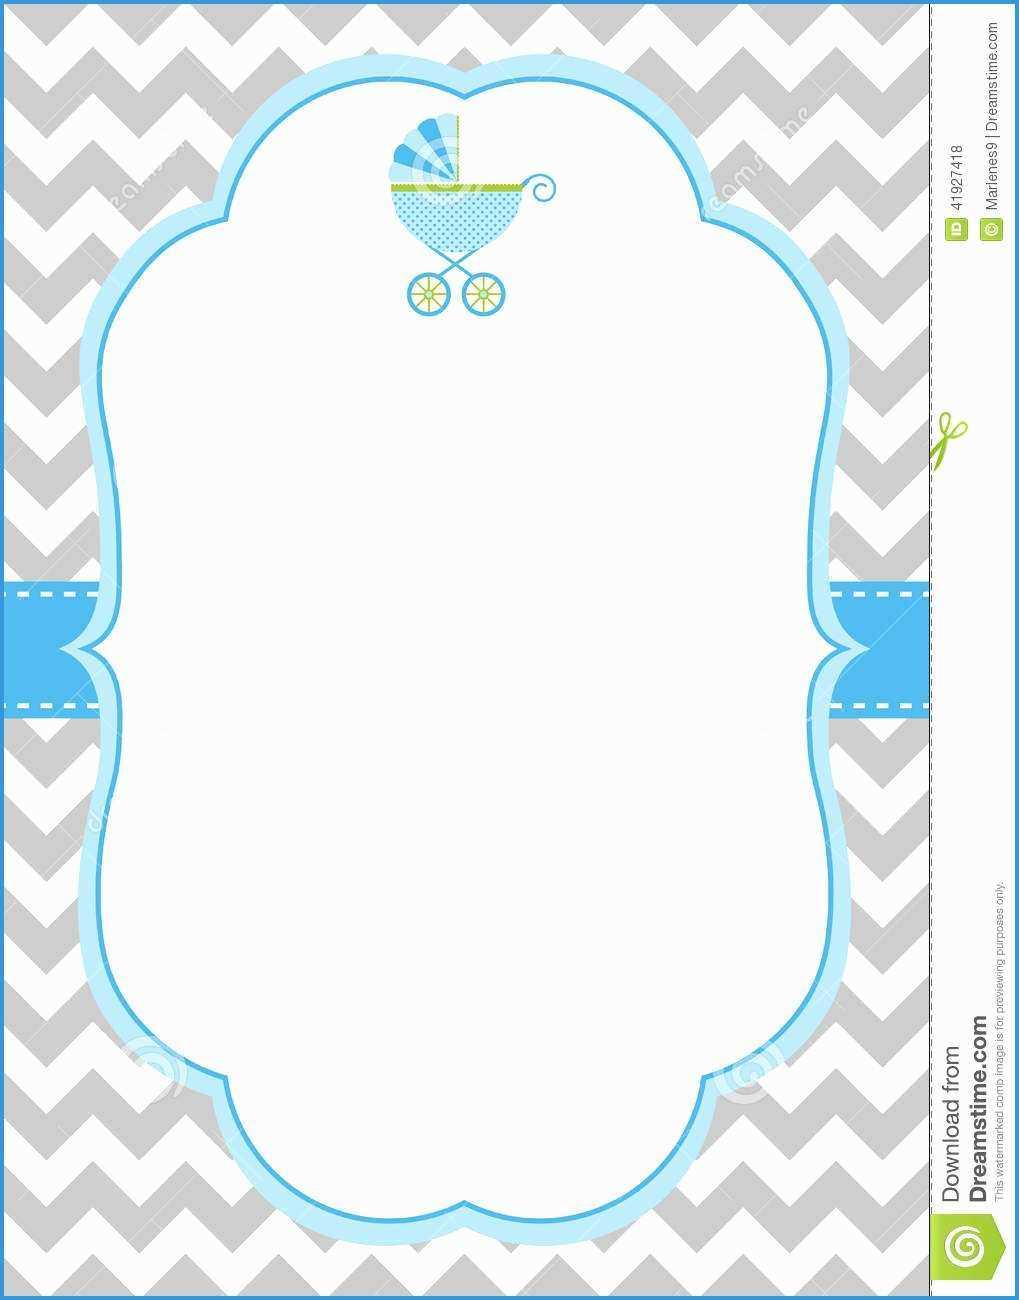 040 Free Baby Shower Invitation Templates Admirable Boy Card Within Free Baby Shower Invitation Templates Microsoft Word